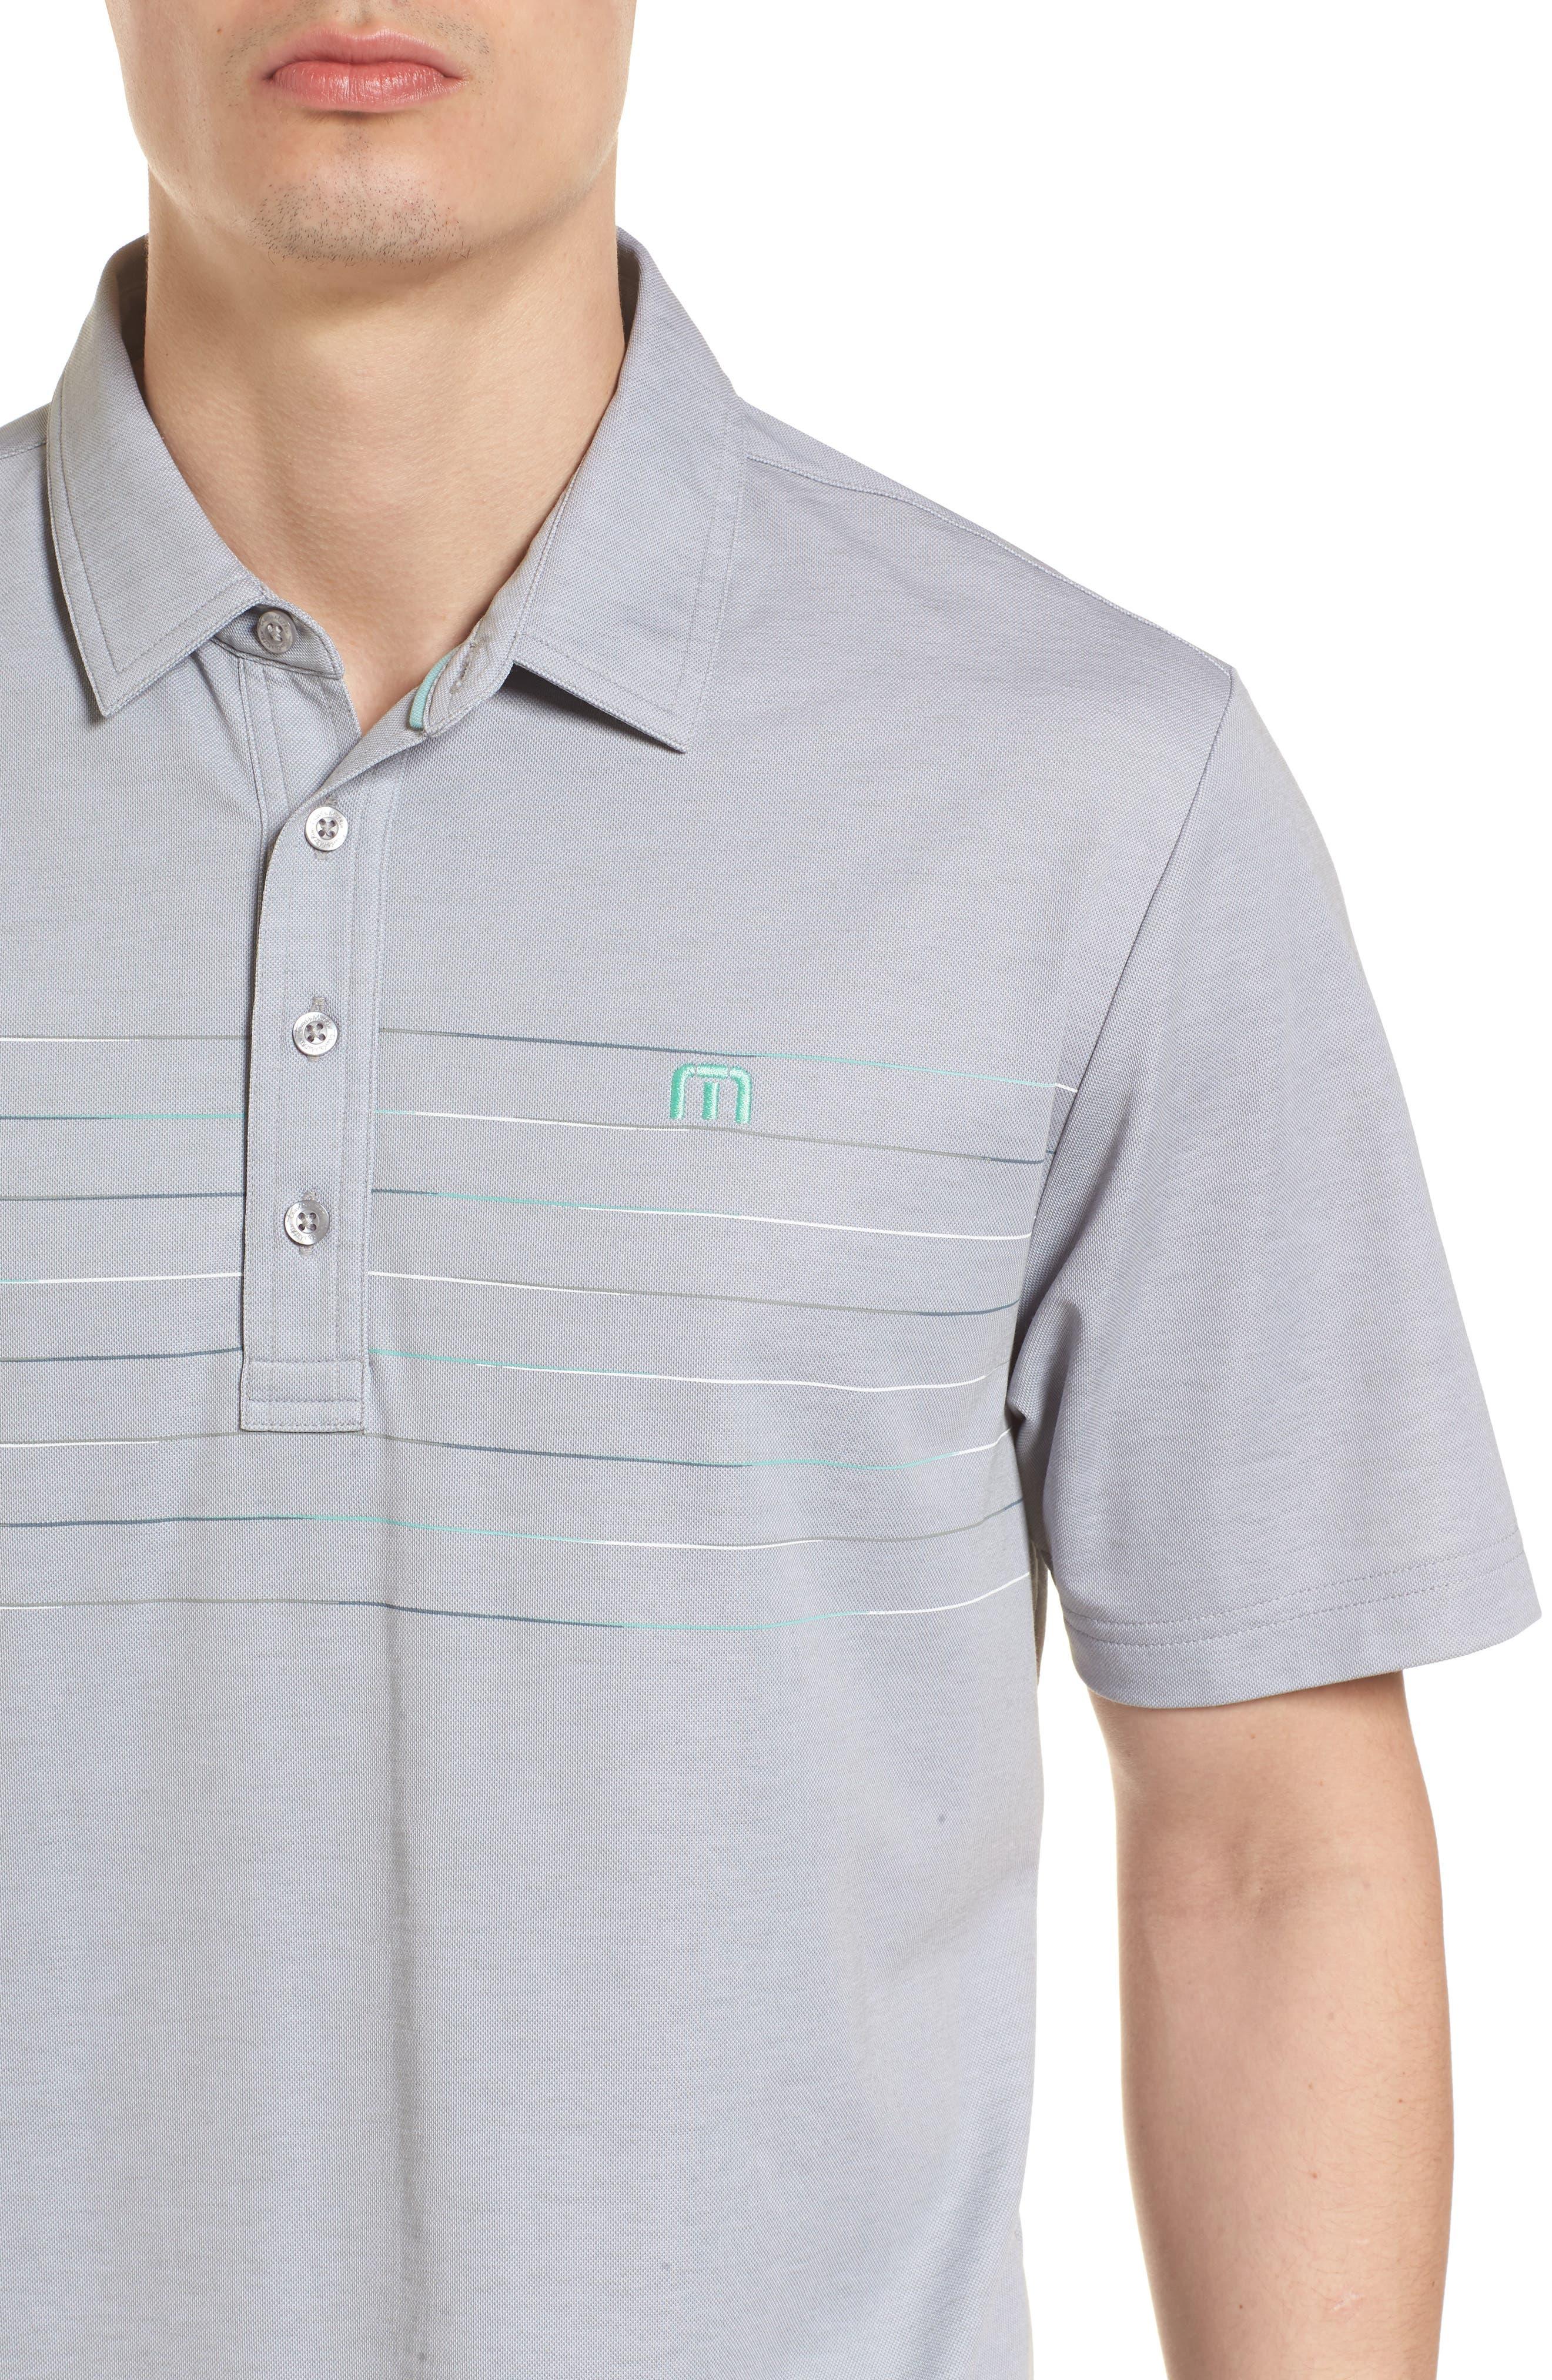 Good Good Polo Shirt,                             Alternate thumbnail 4, color,                             Heather Grey Monument